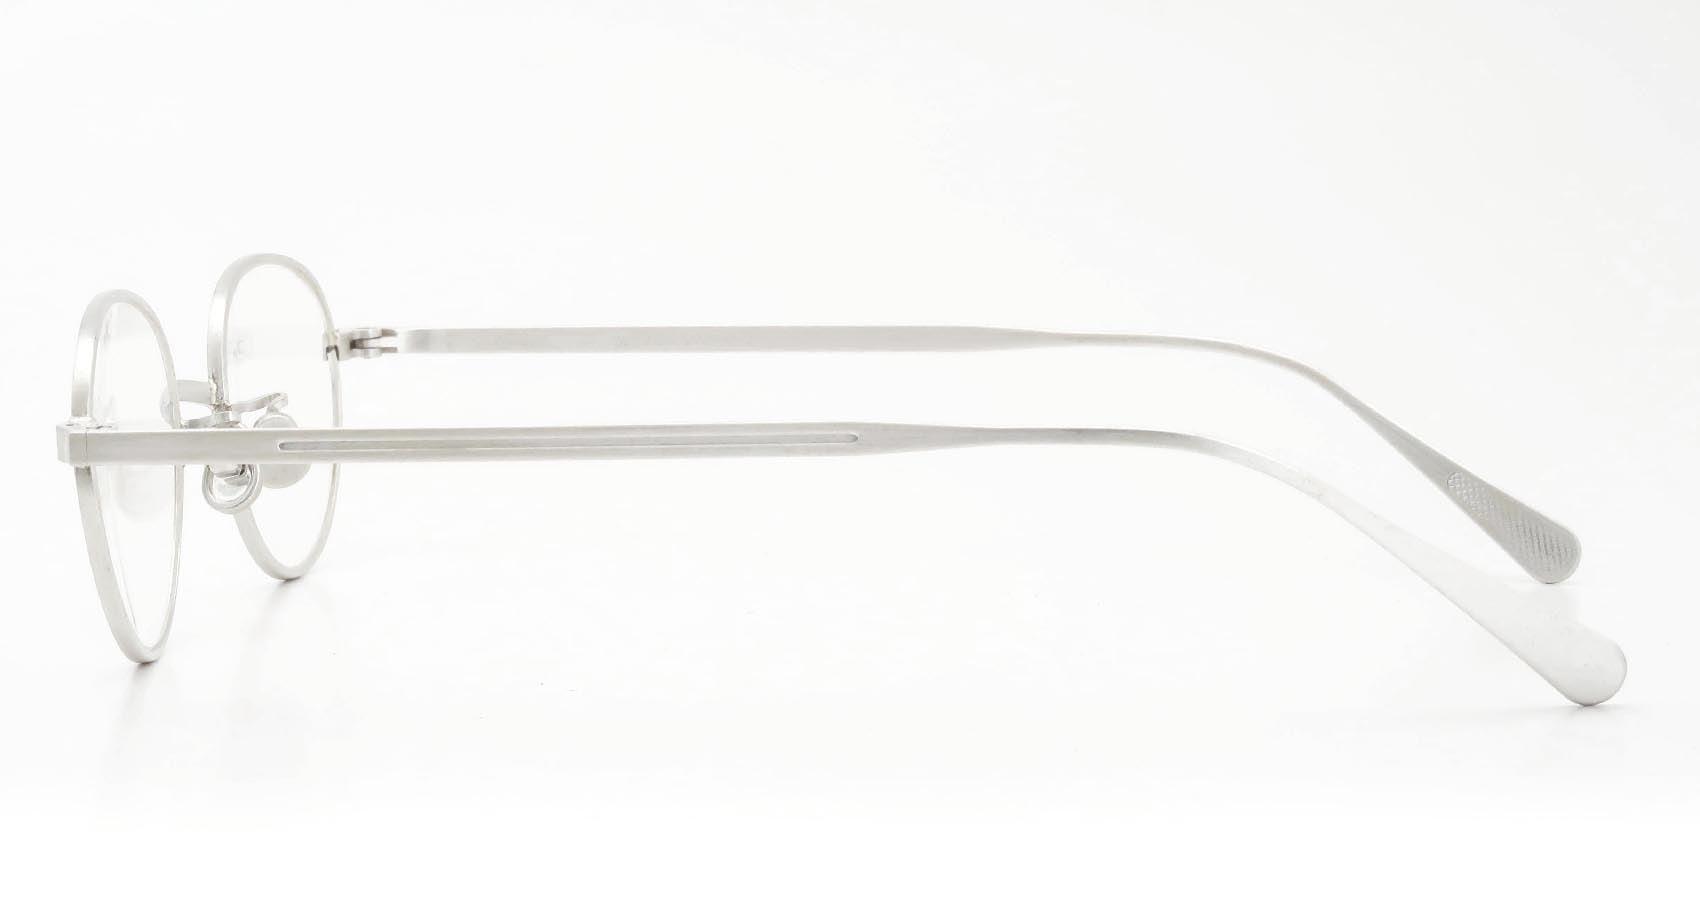 GERNOT LINDNER GL200 mod.208 Golf 3